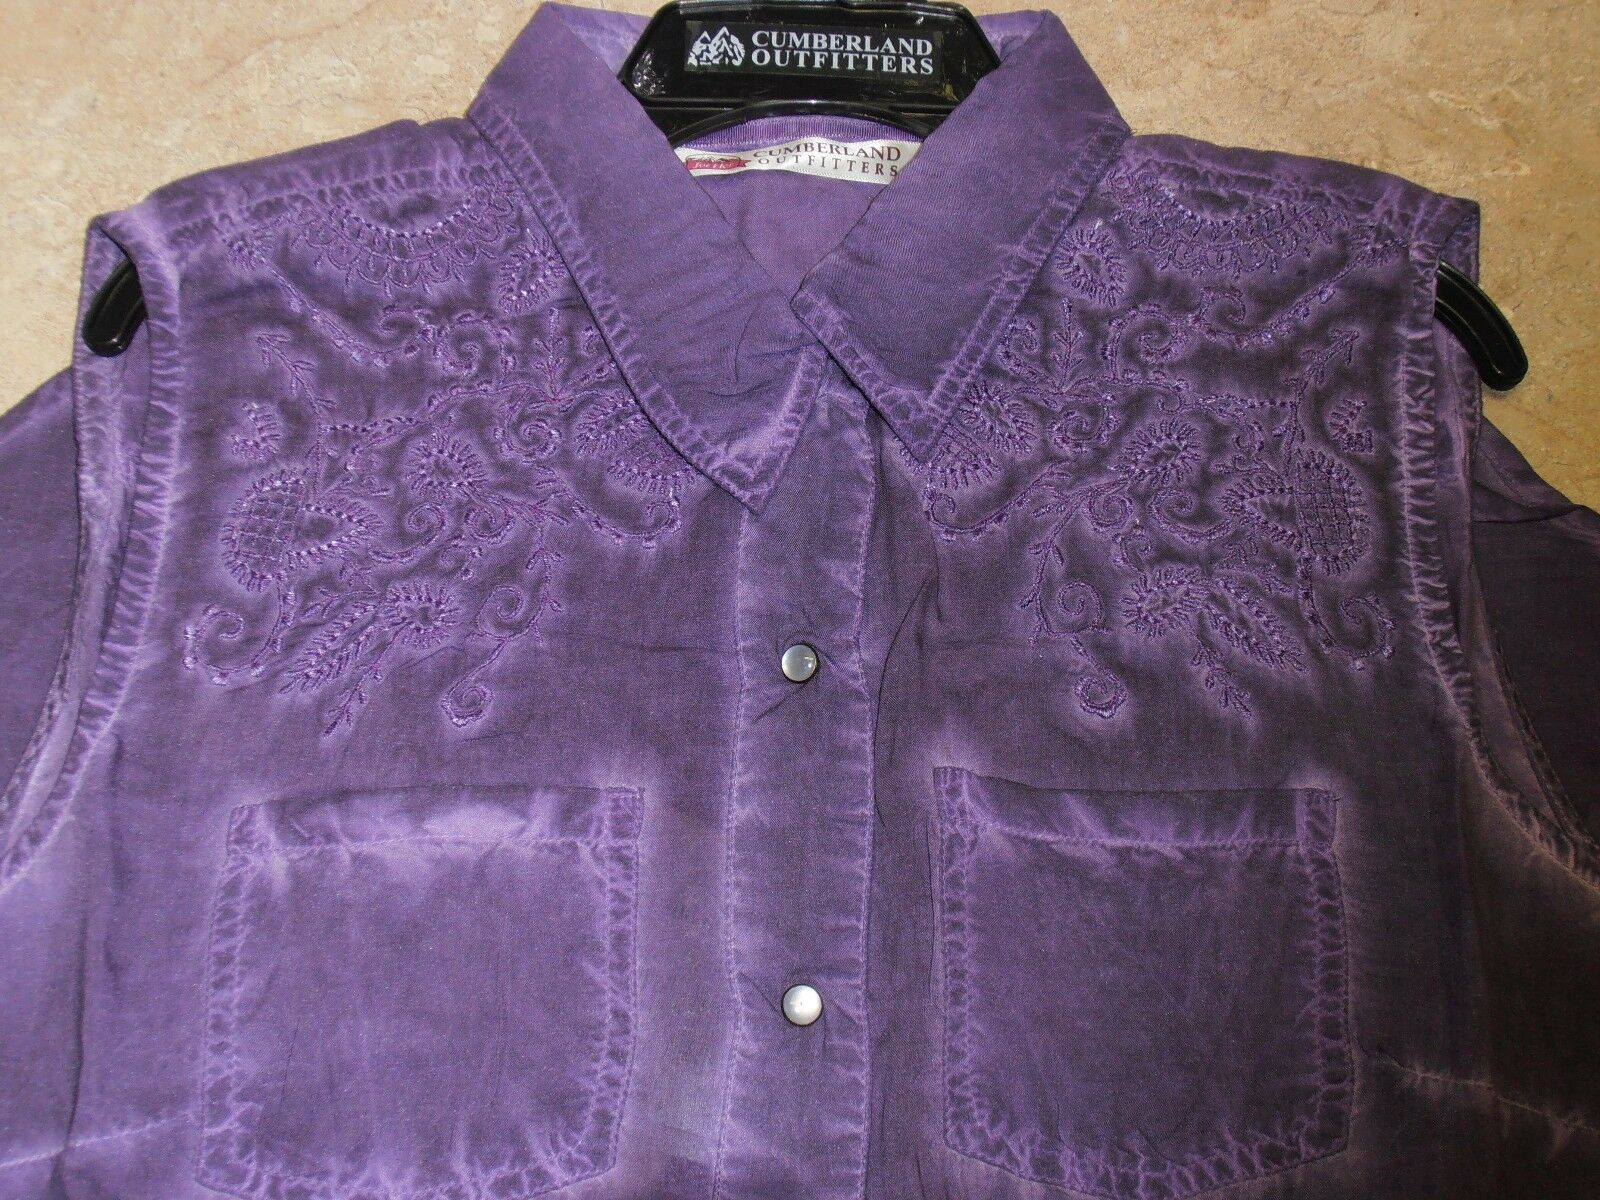 Ladies Purple Tie Dye Marbled Show Barrel Racing Riding Sleeveless Summer Shirt